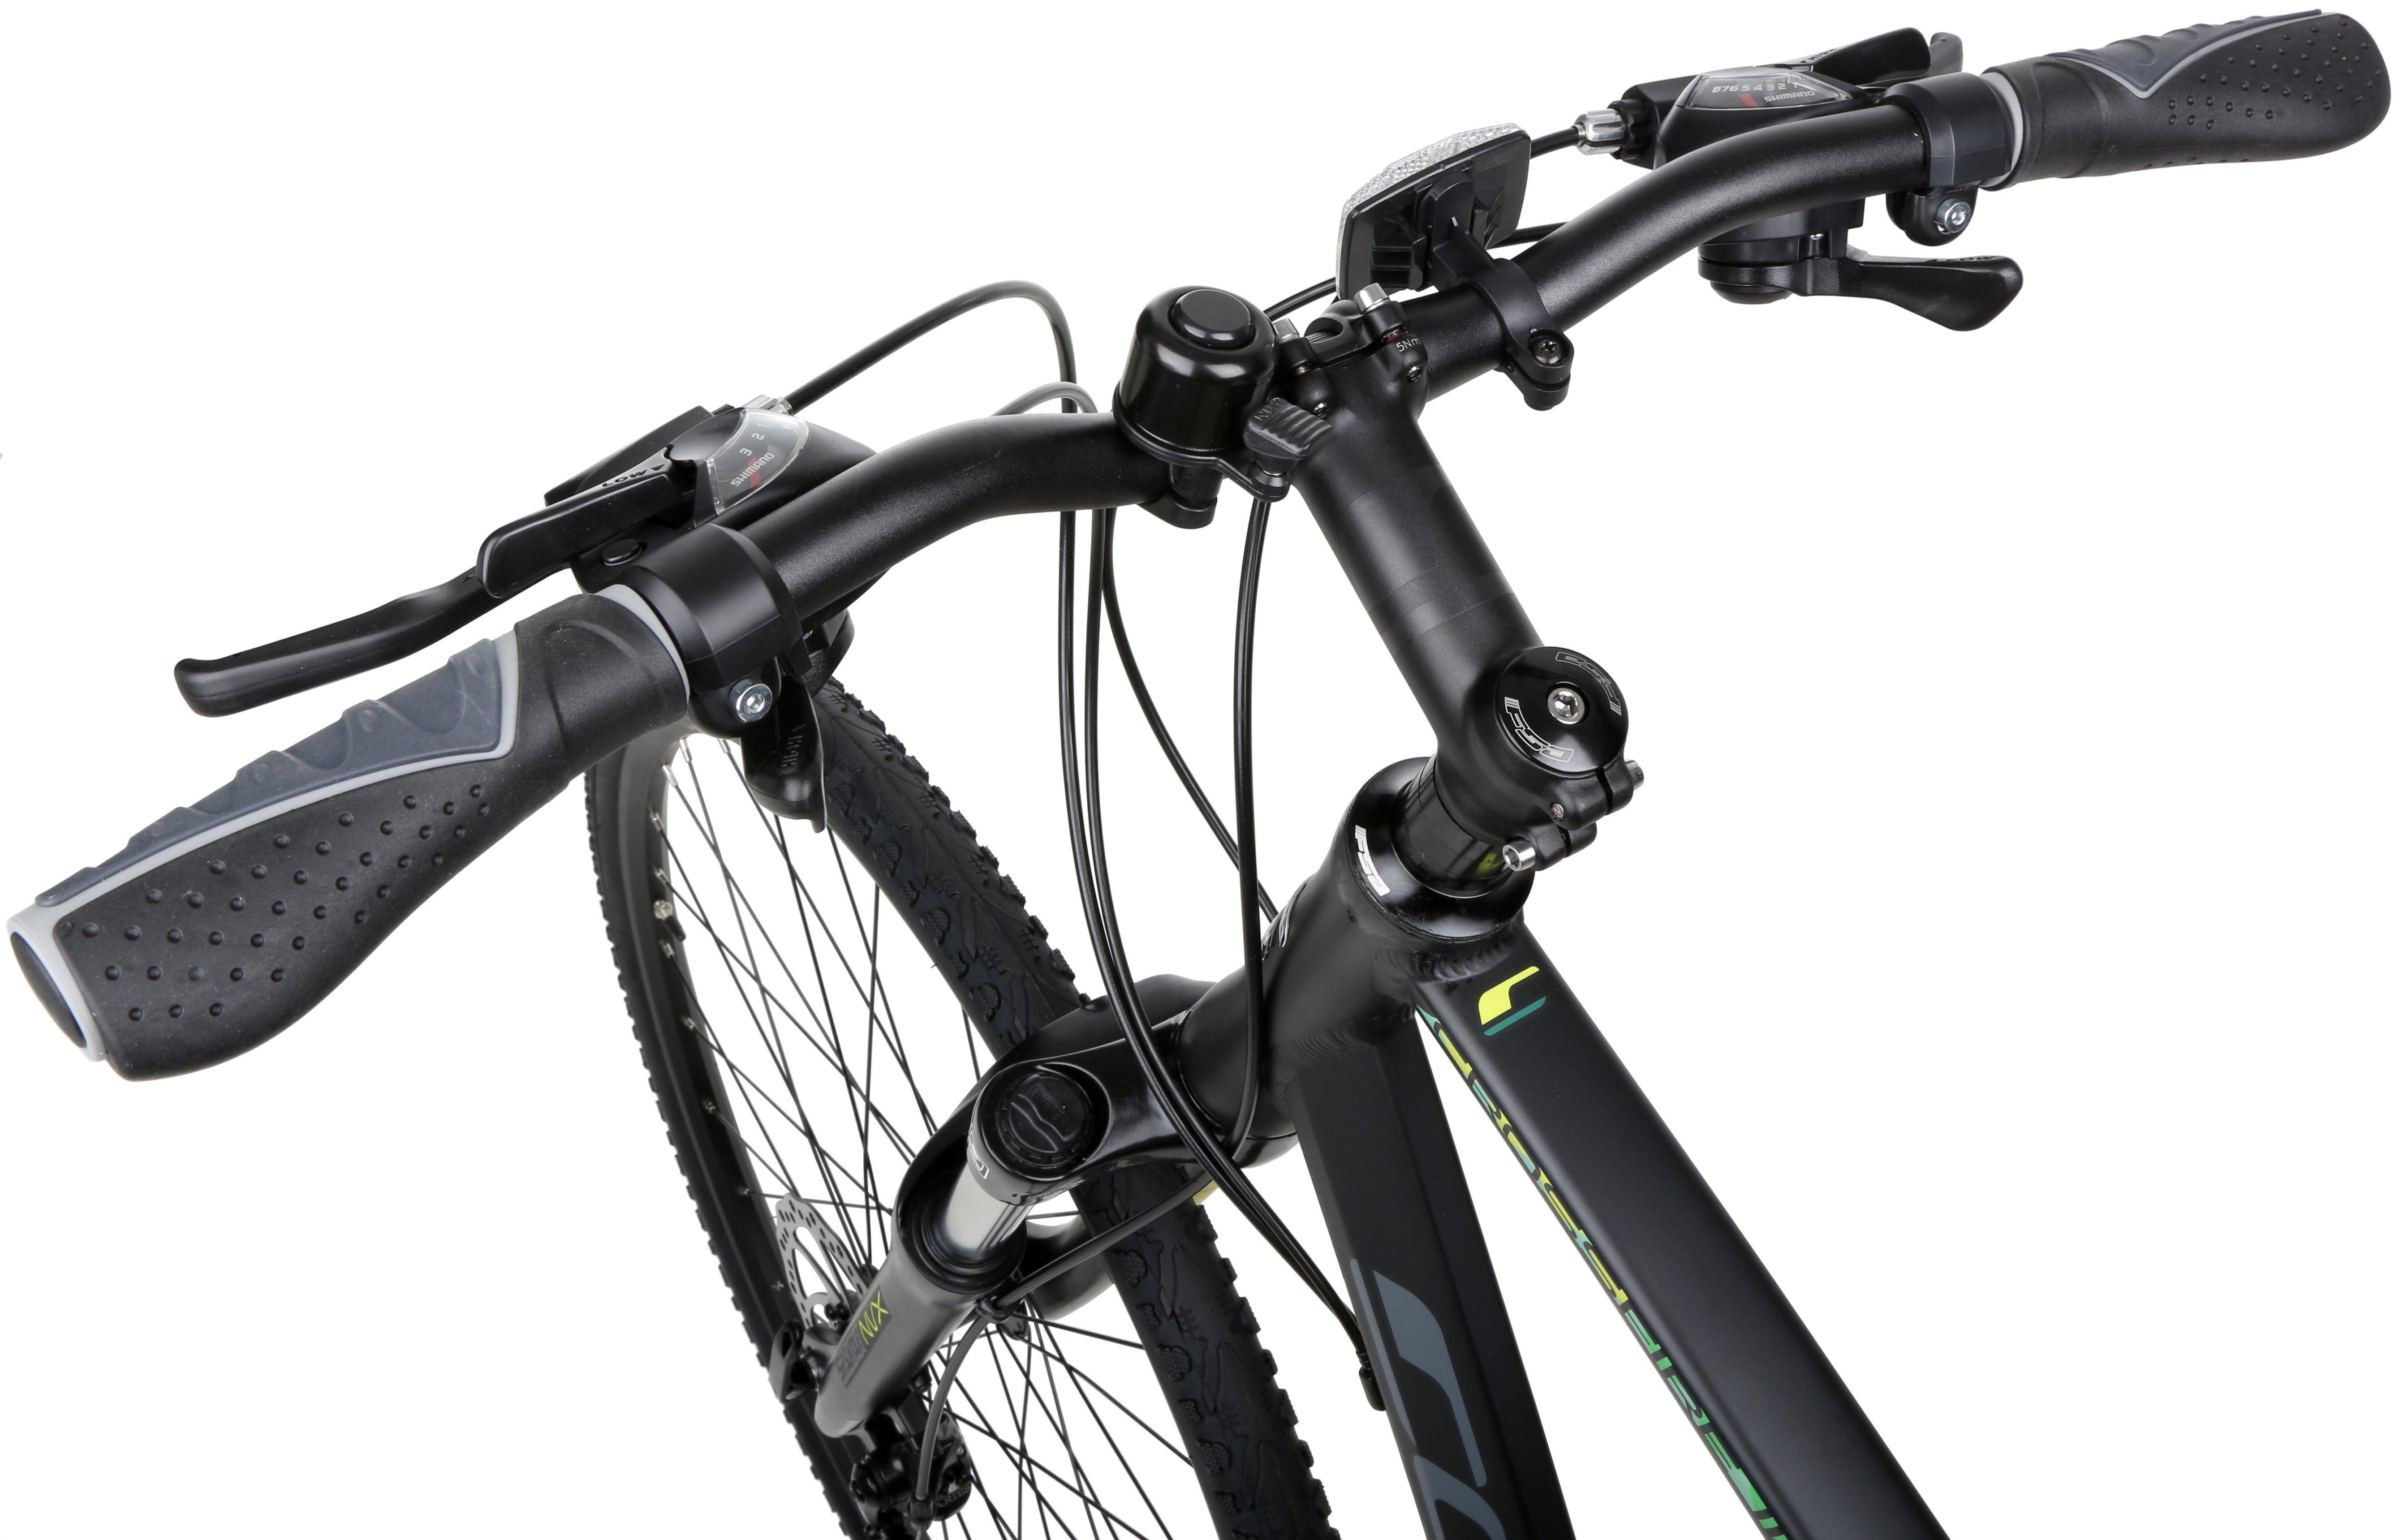 Details about Carrera Crossfire 2 Mens Hybrid Bike Bicycle 24 Gears Shimano  700C Wheels Black